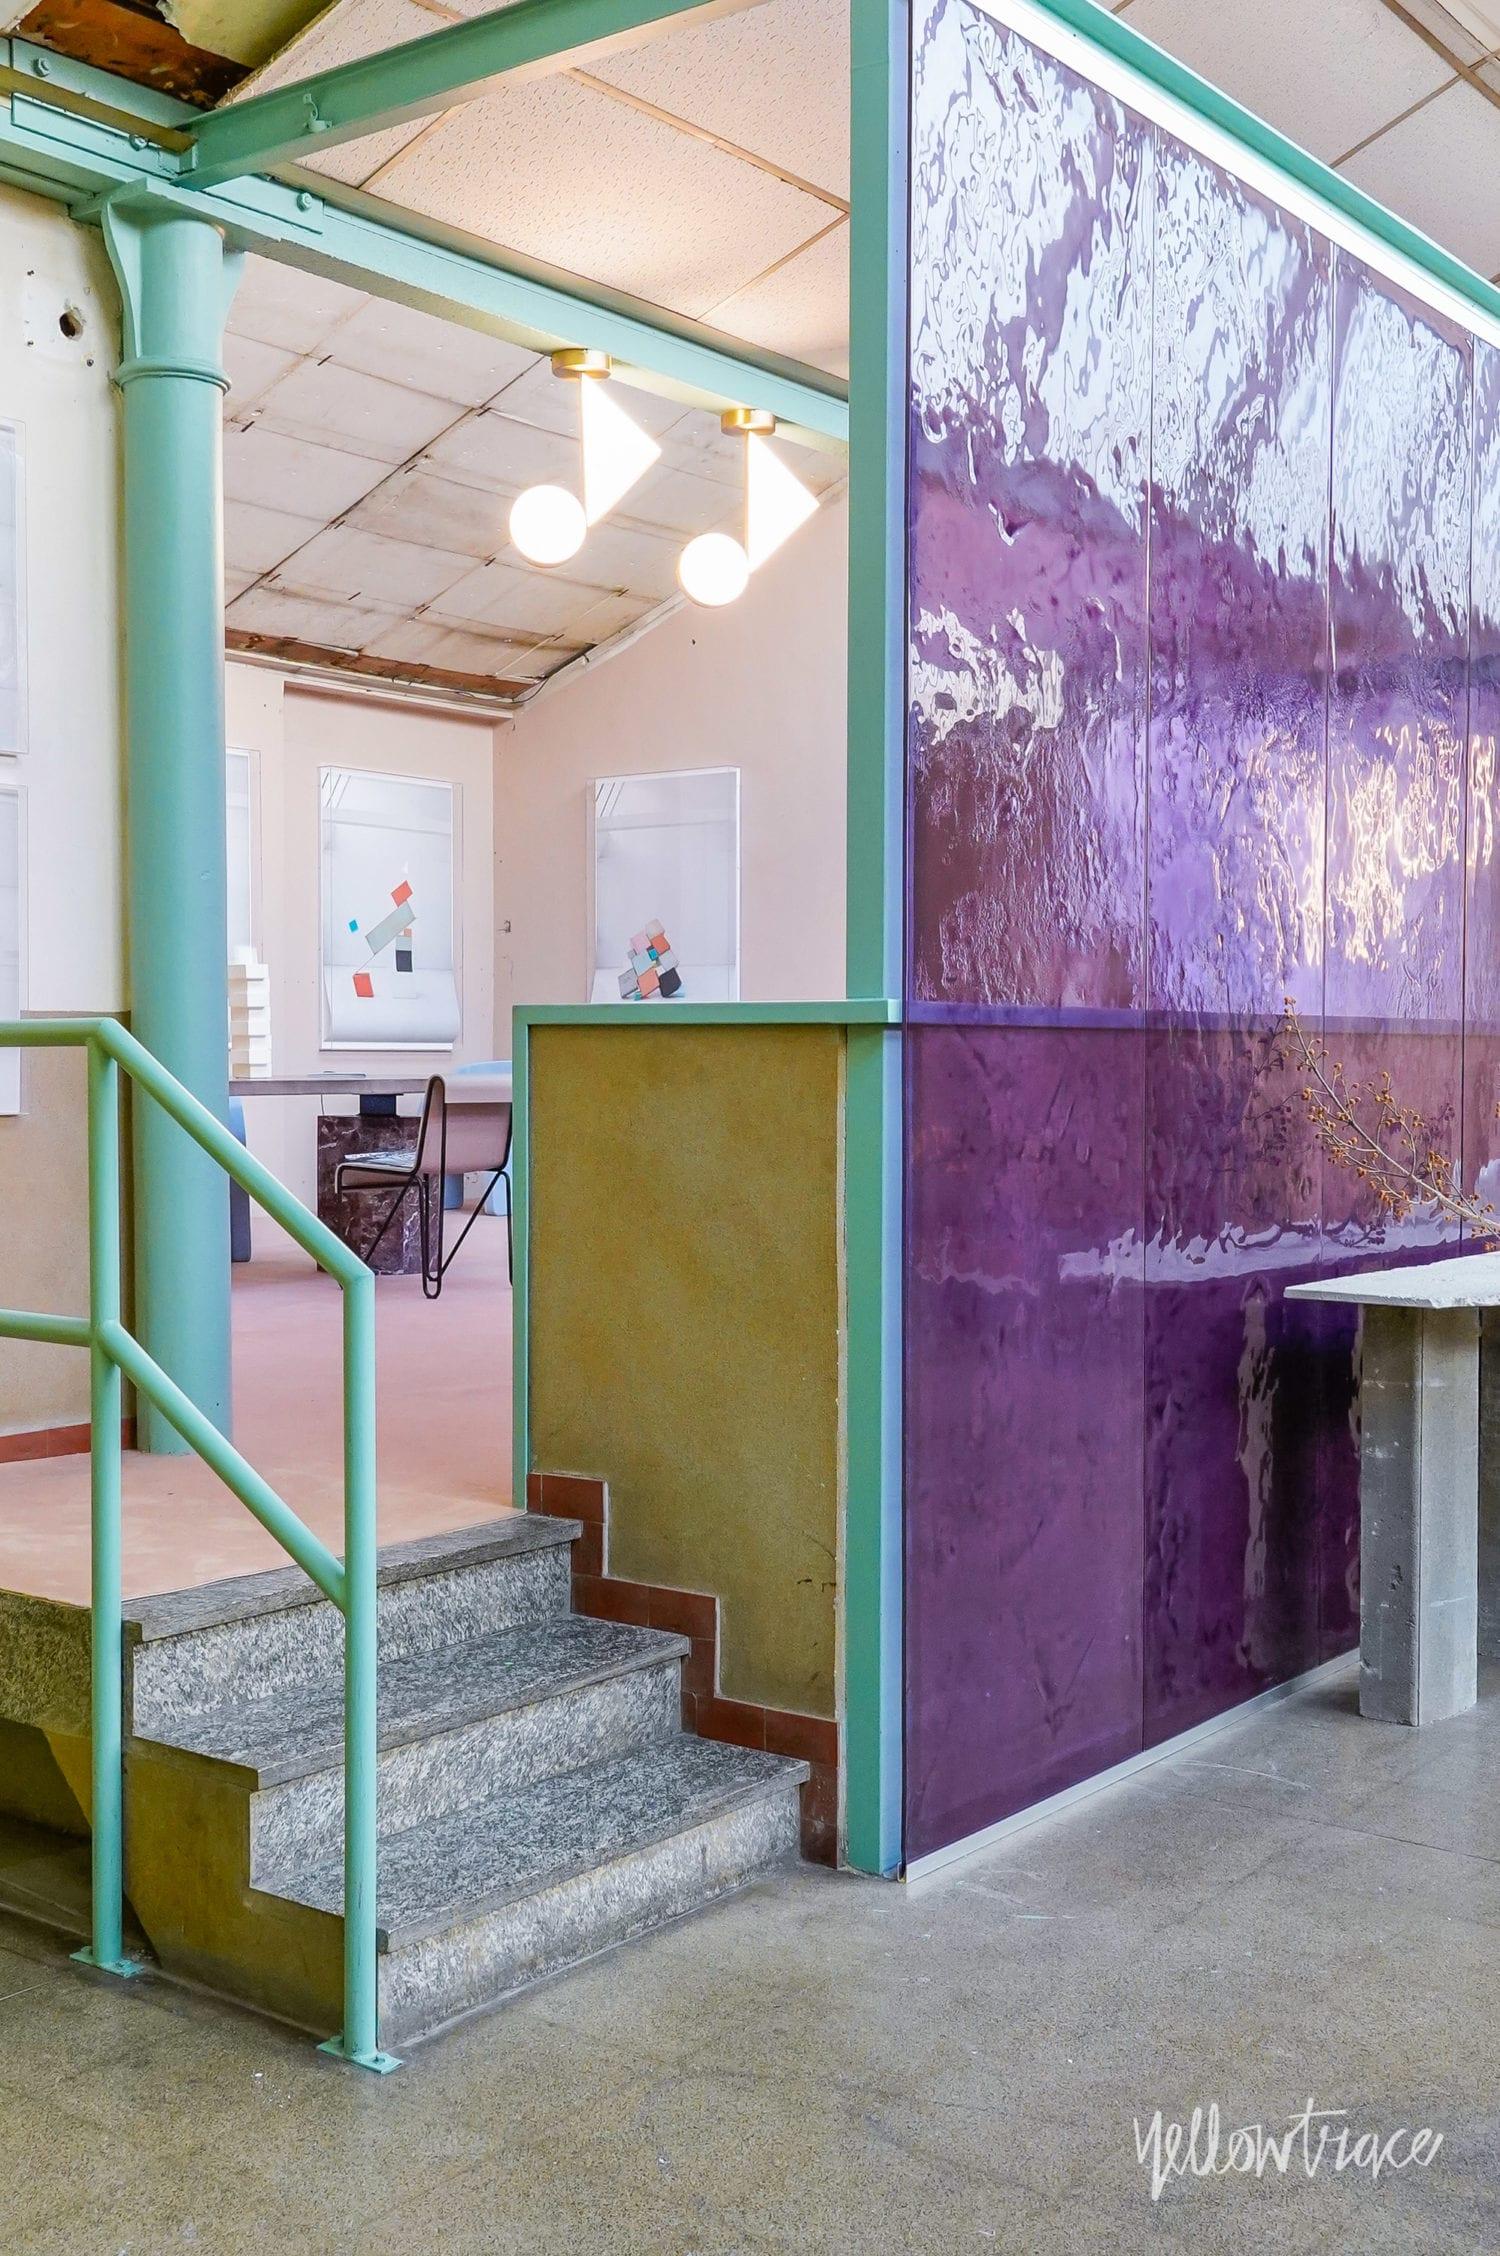 Les Arcanistes Studiopepe At Milan Design Week 2019 Photo Nick Hughes Yellowtrace 12